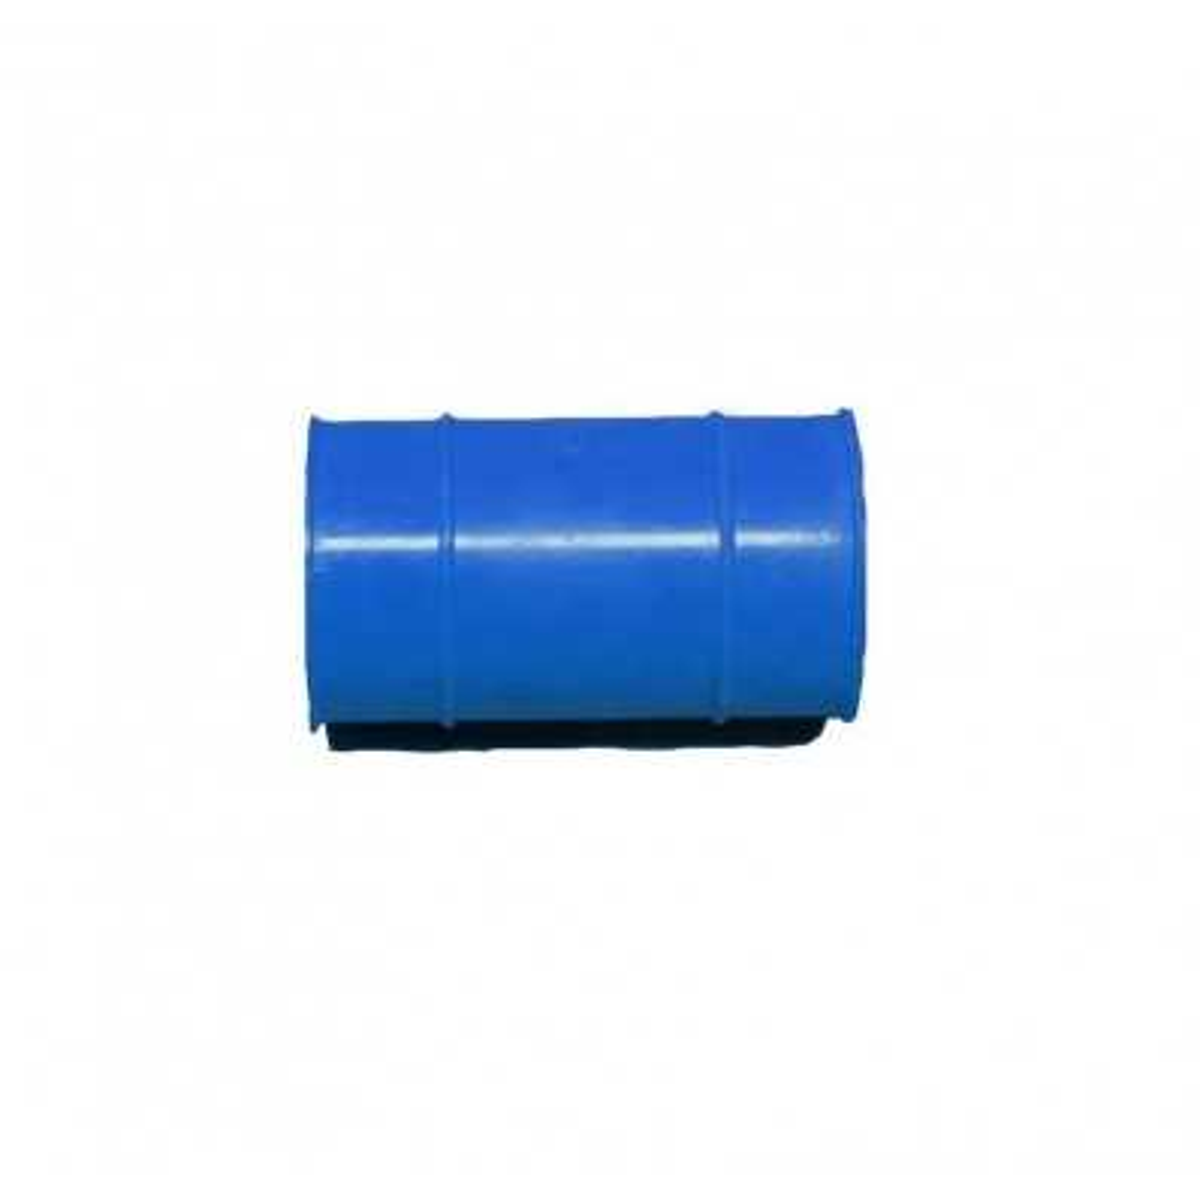 4MX480210-AZ - Goma Ujnion Escape 4Mx 125 200Cc Azul